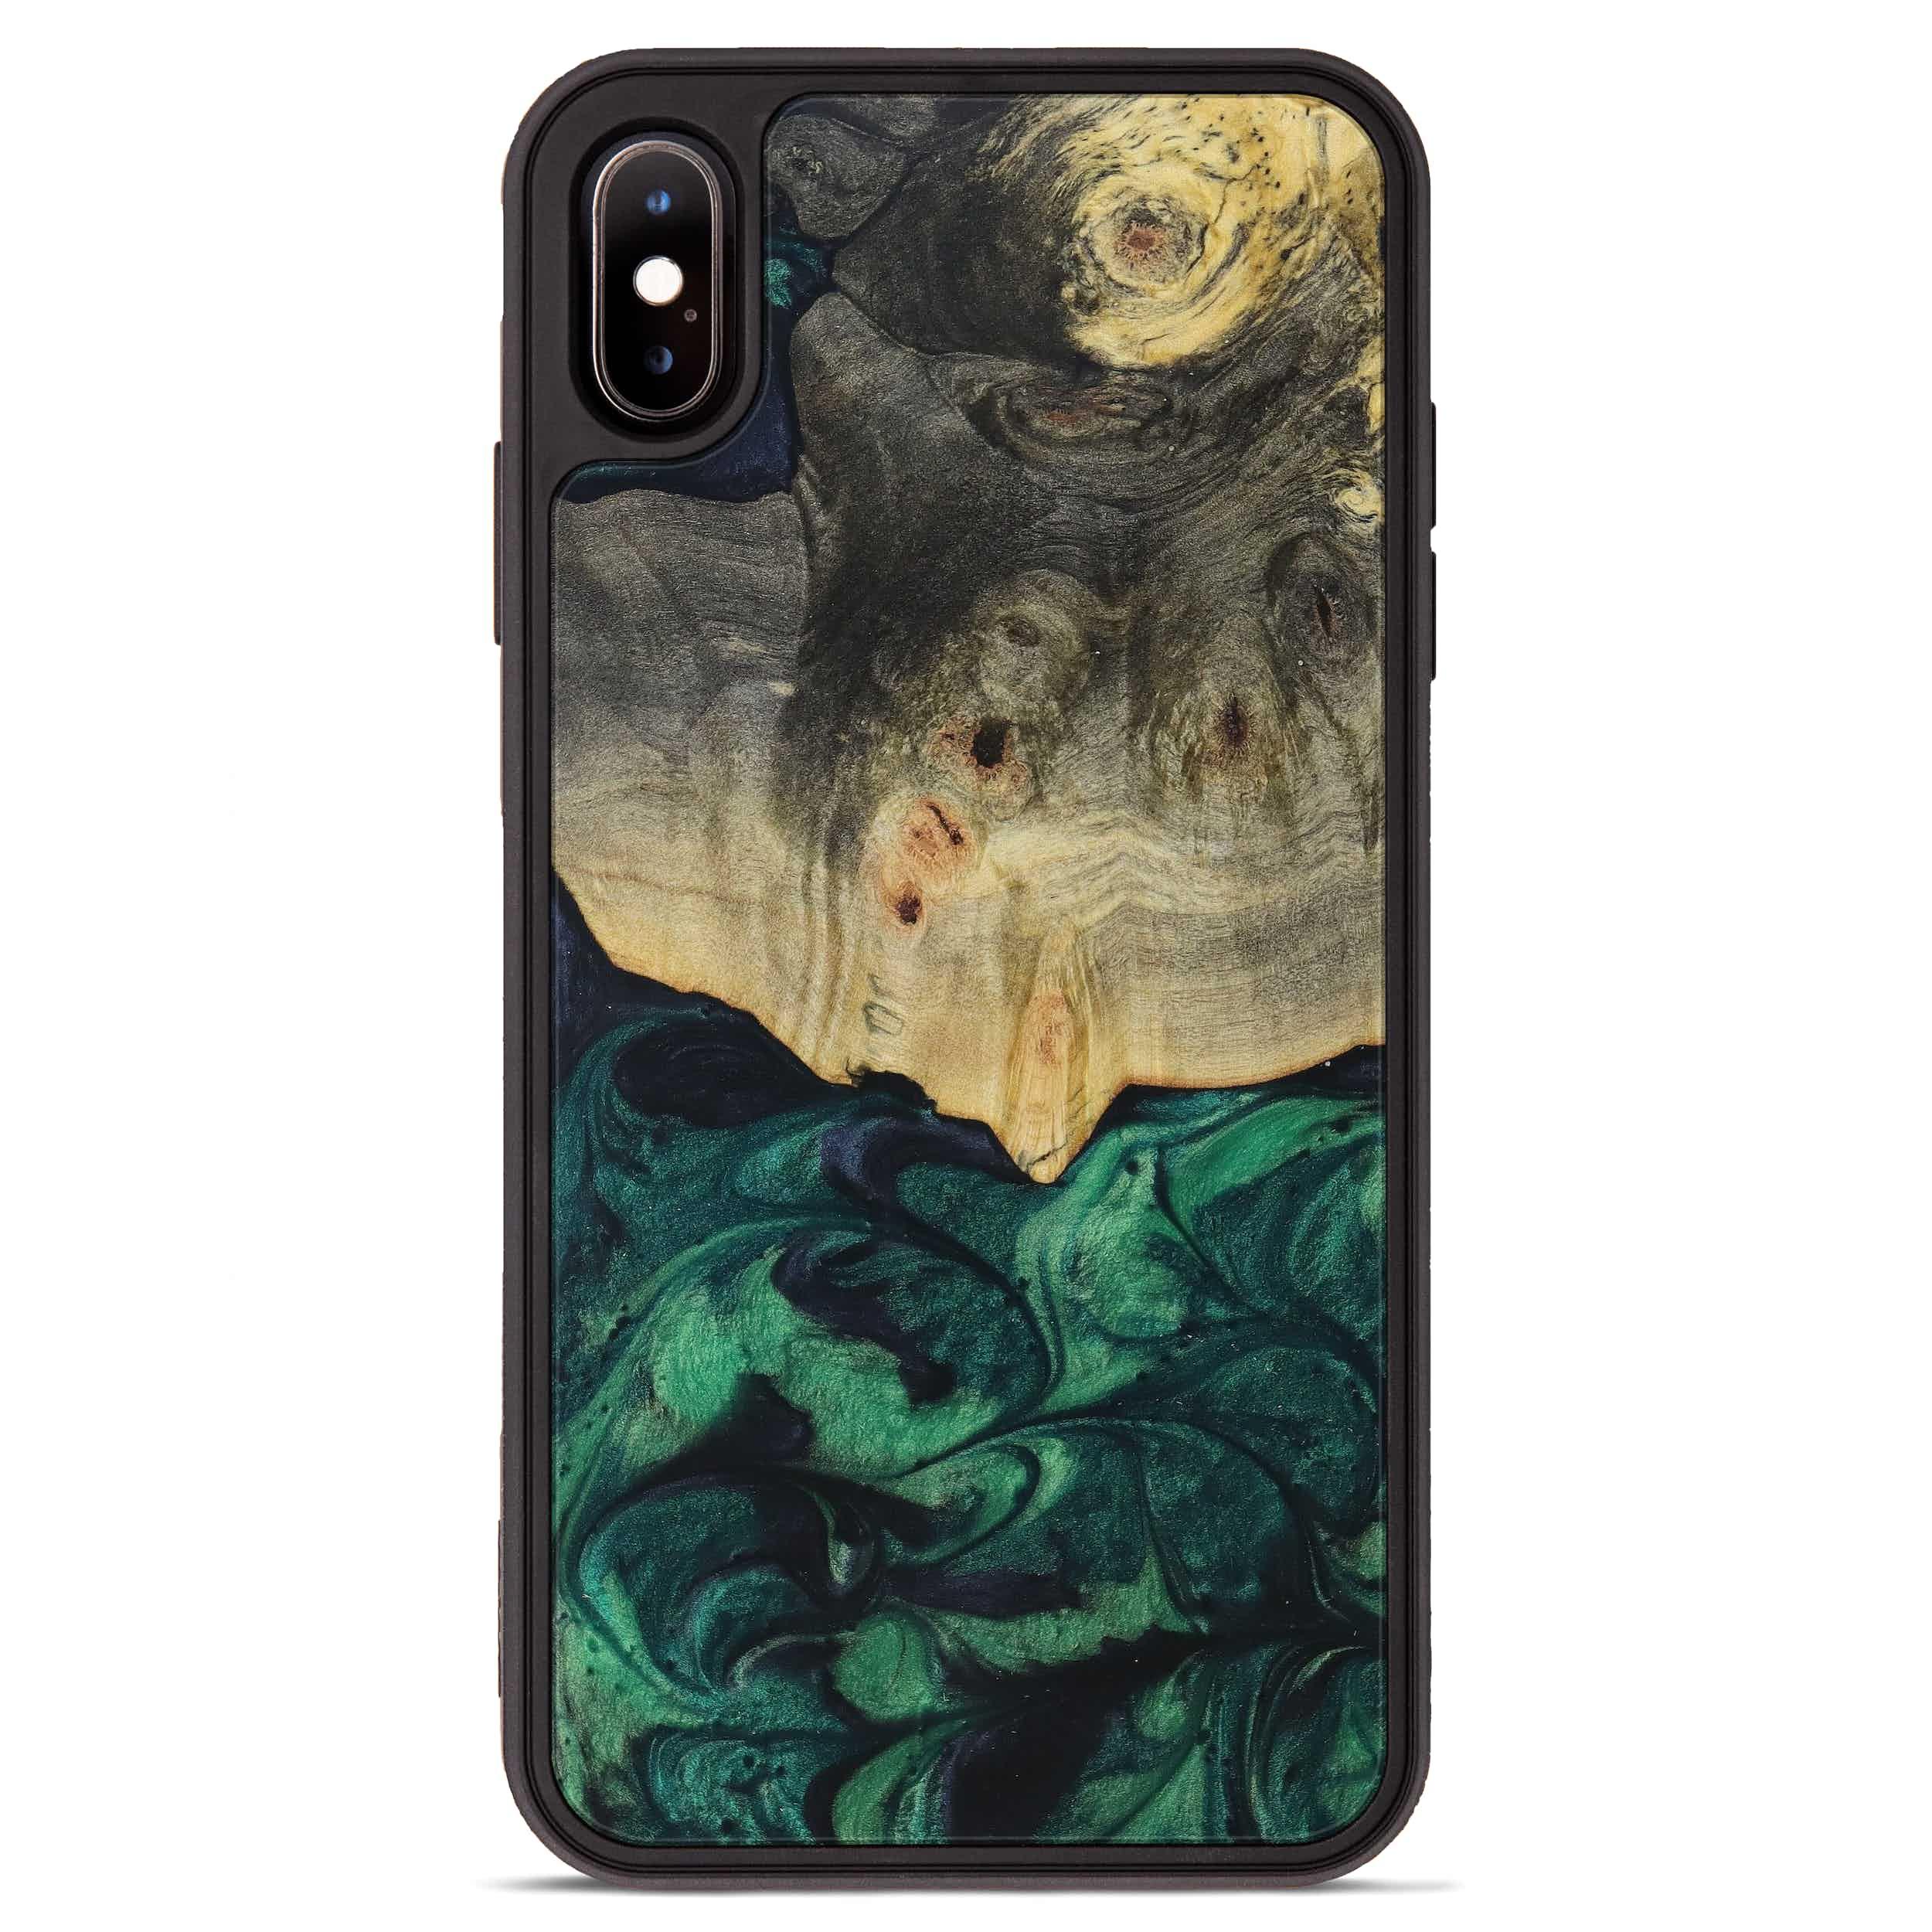 iPhone Xs Max Wood+Resin Phone Case - Ivo (Dark Green, 394669)